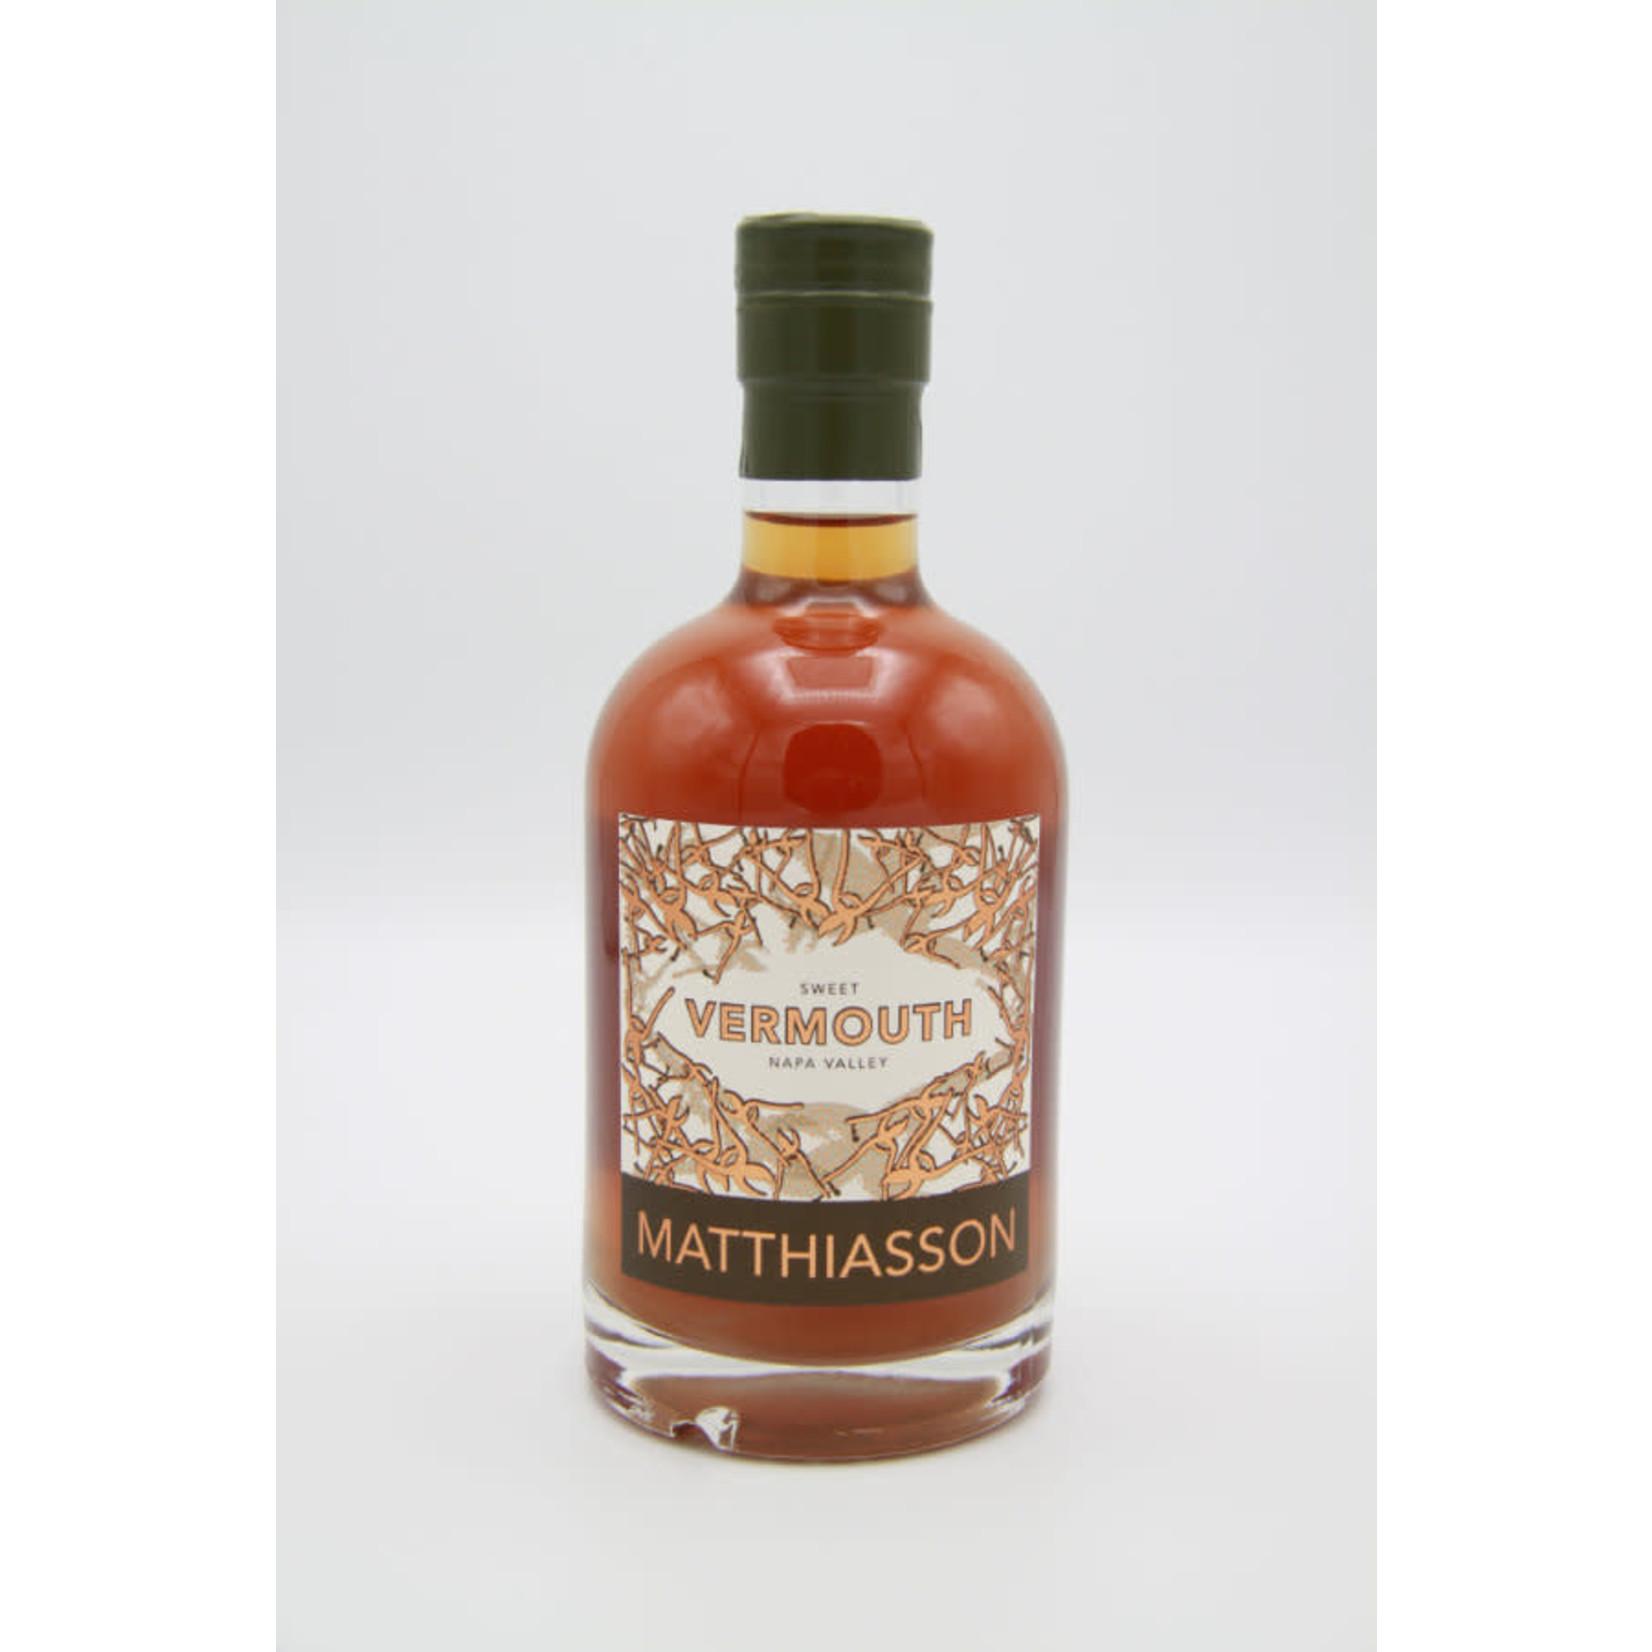 NV Matthiasson Family Vineyards 'No. 4' Sweet Vermouth (375 ml)